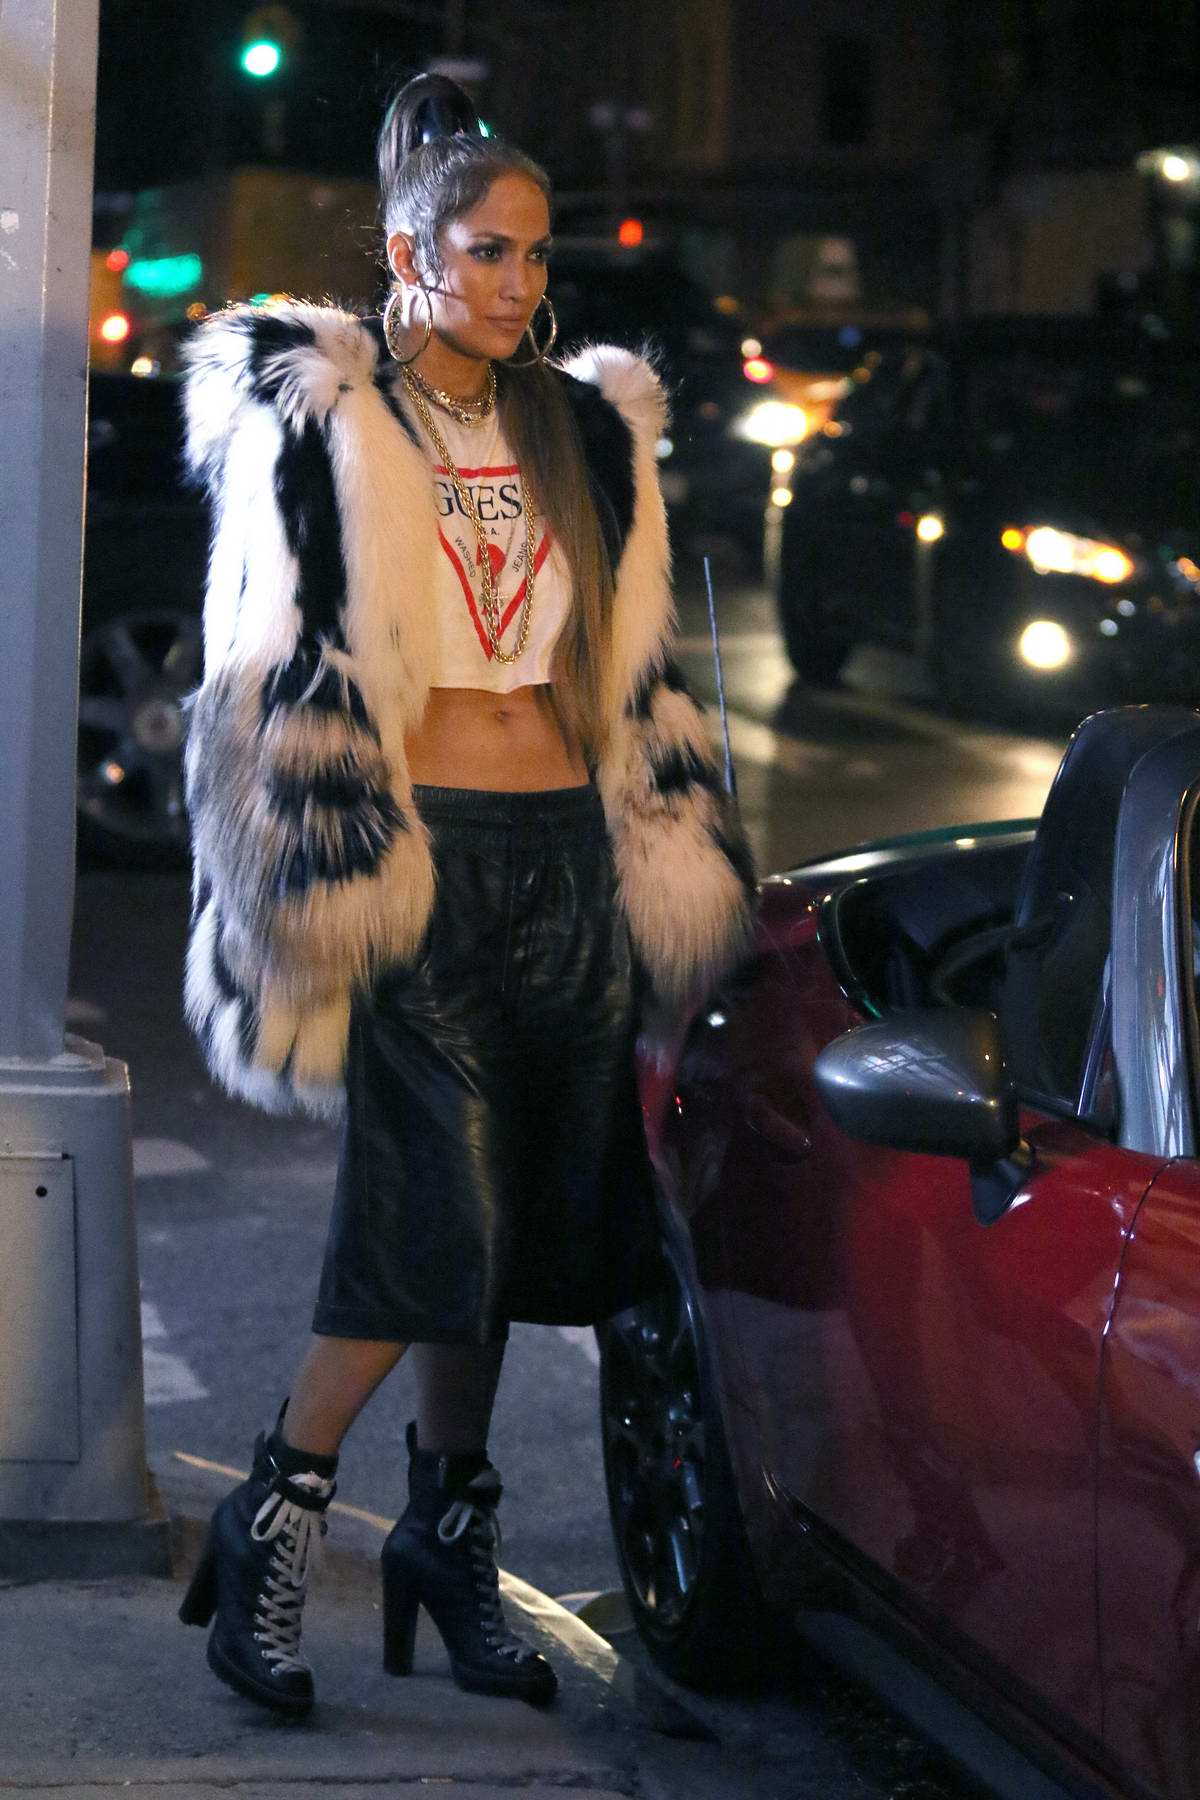 Jennifer Lopez filming her latest music video 'Amor' in the early morning in Soho neighborhood in New York